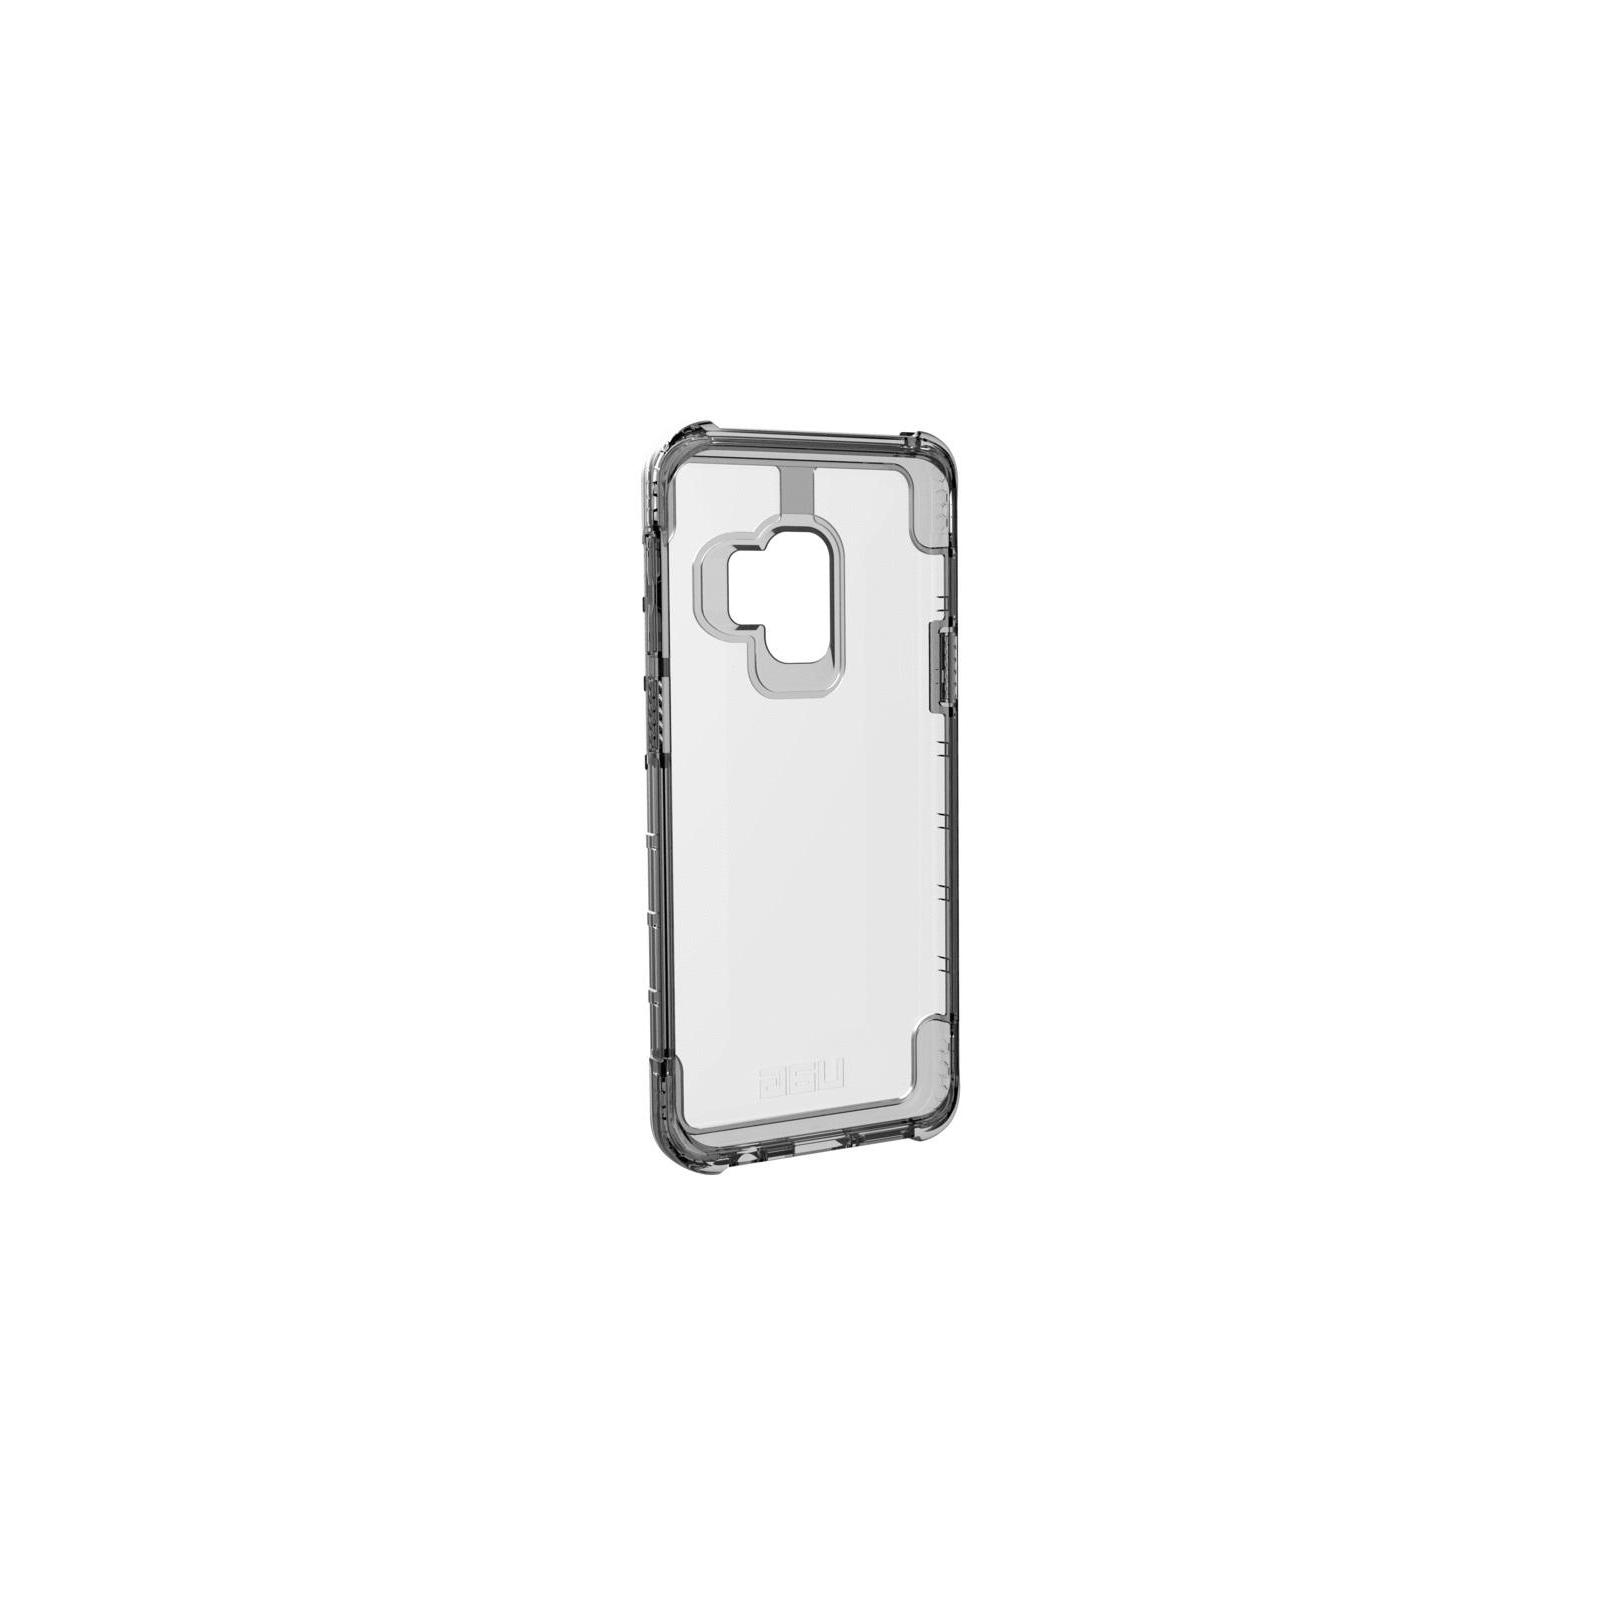 Чехол для моб. телефона Uag Galaxy S9 Plyo Ice (GLXS9-Y-IC) изображение 2